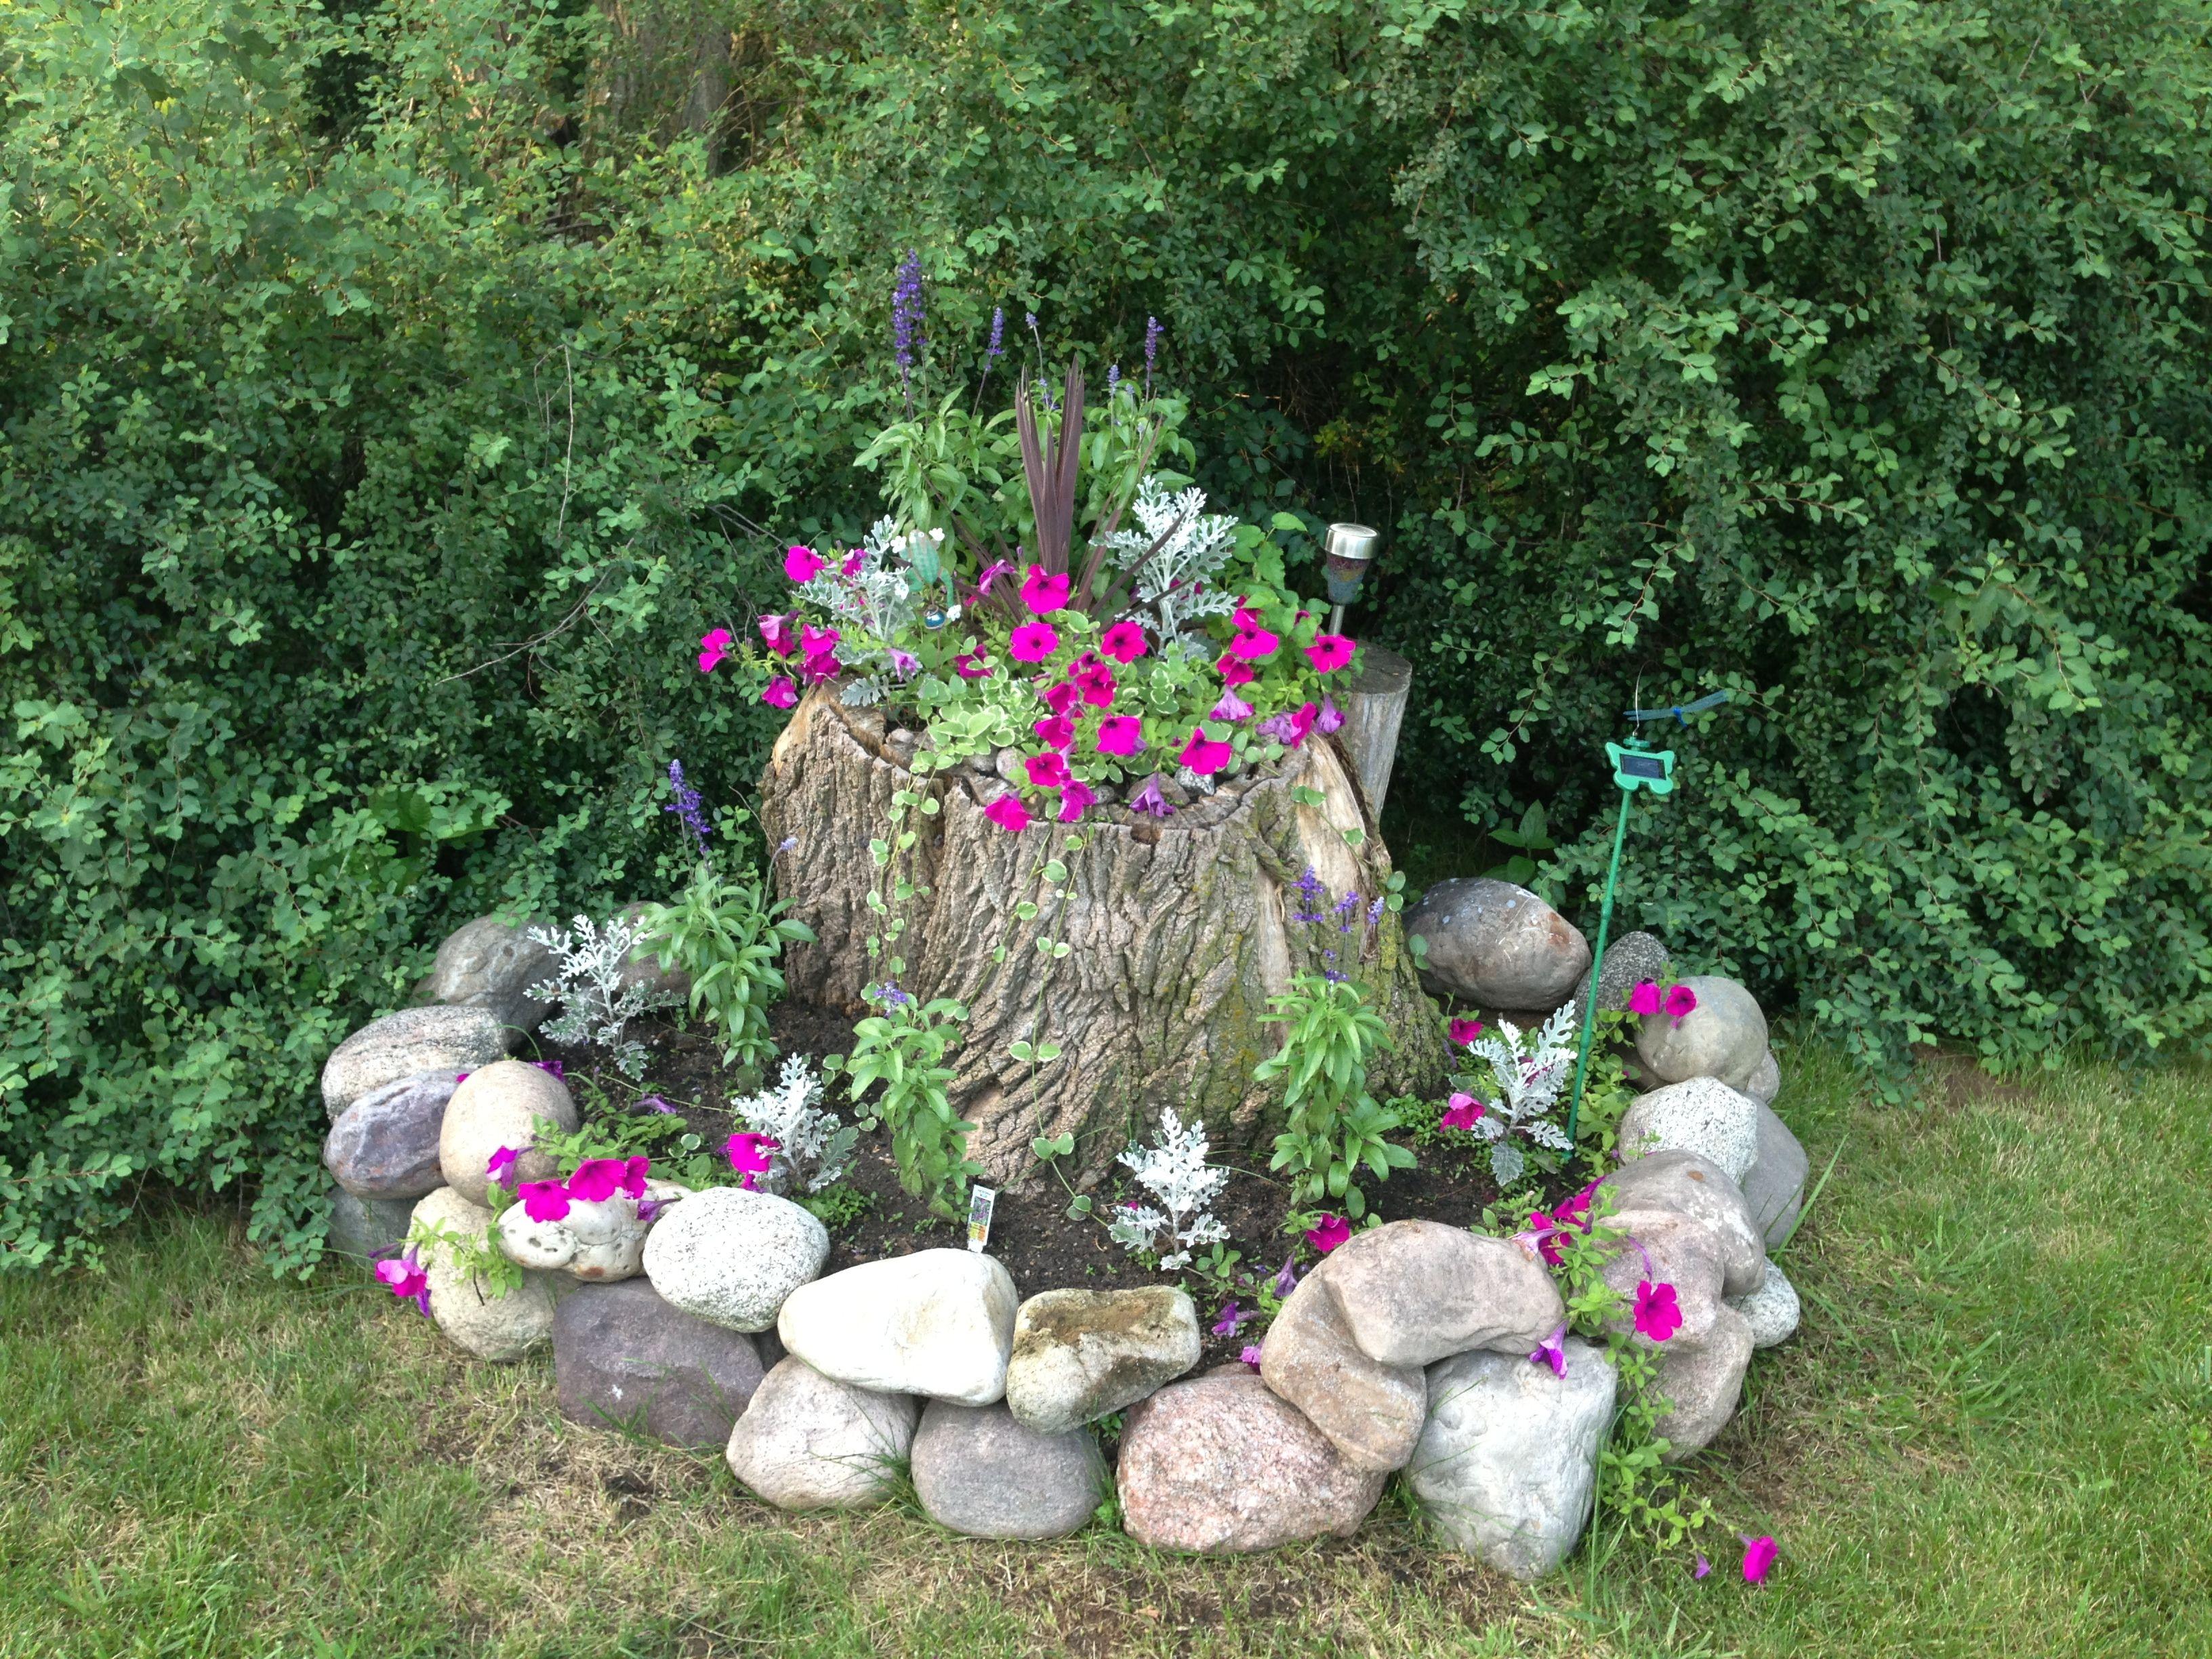 Tree Stump Flower Pot Garden Pots Potted Trees